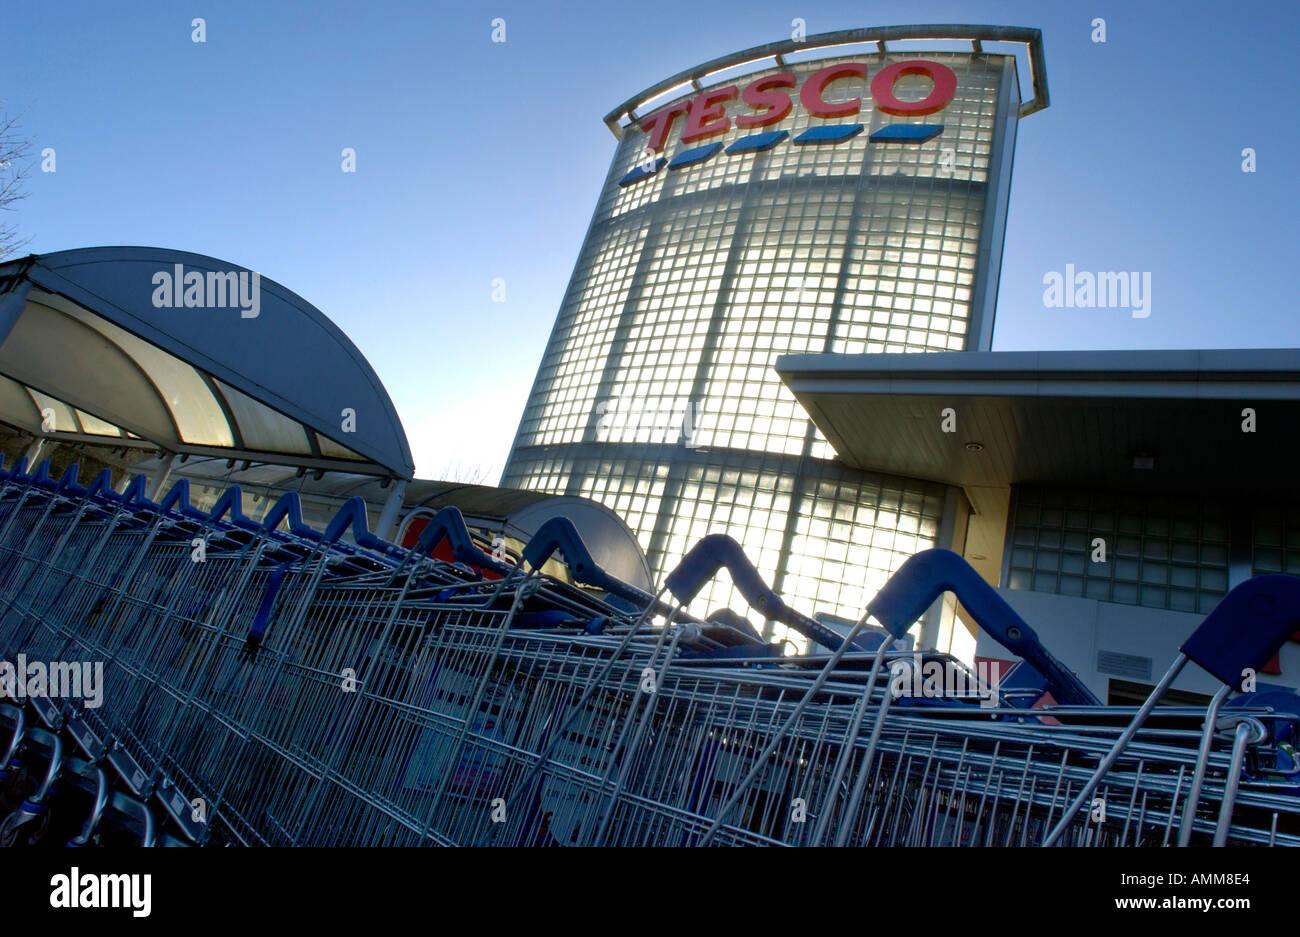 Tesco sign on a Tesco Supermarket at Winchester, Hampshire UK - Stock Image